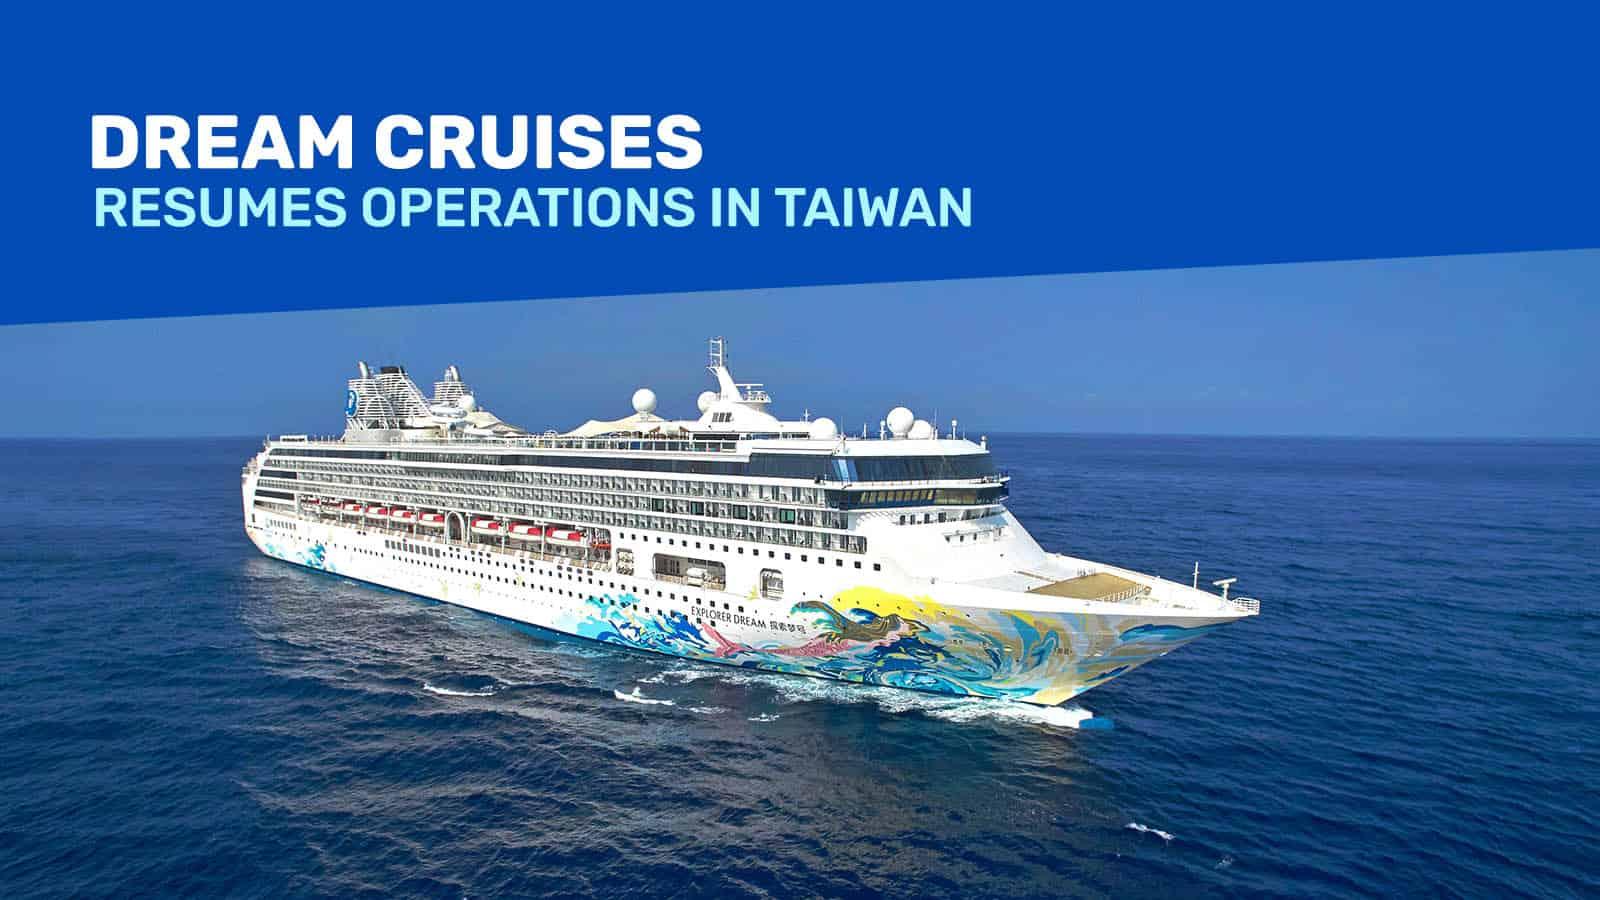 DREAM CRUISES将在台湾恢复运营|穷游网行程博客